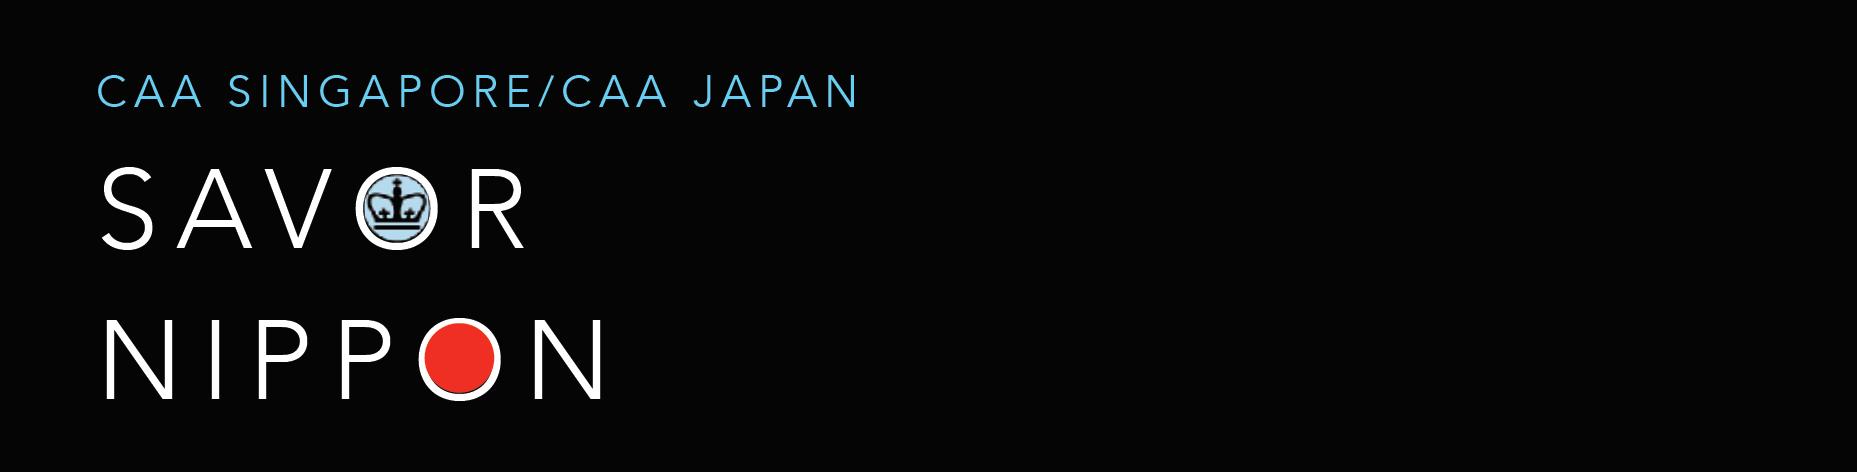 Japan_Trip_Banner.png